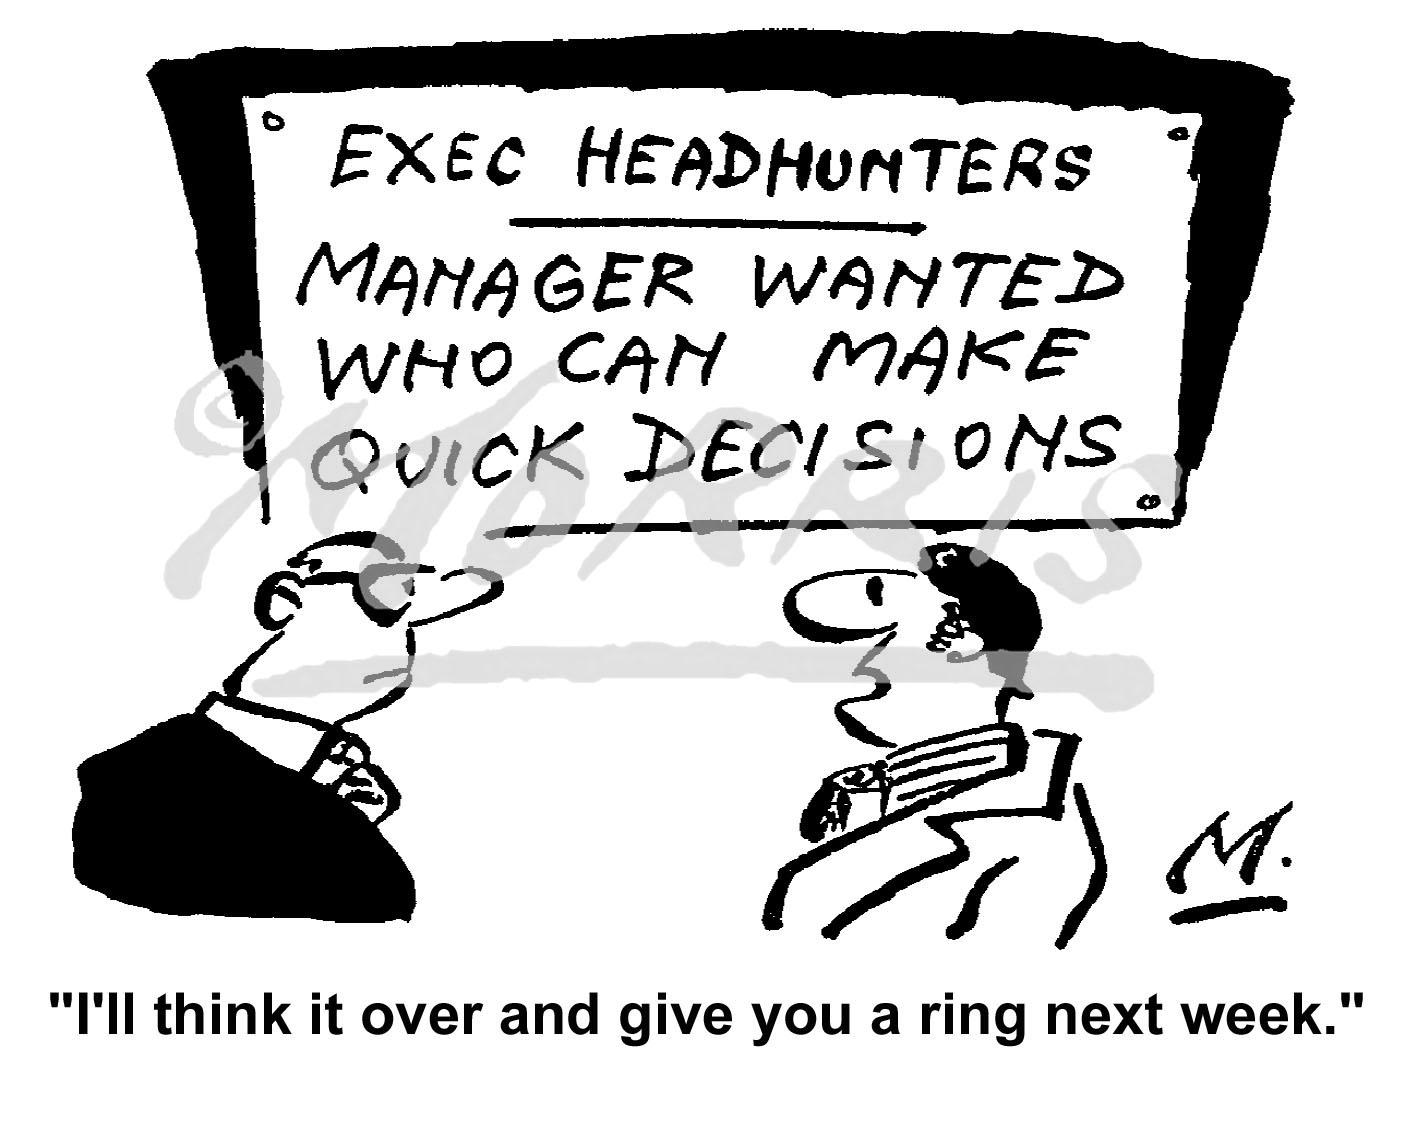 Executive manager job advertisement cartoon Ref: 0849bw